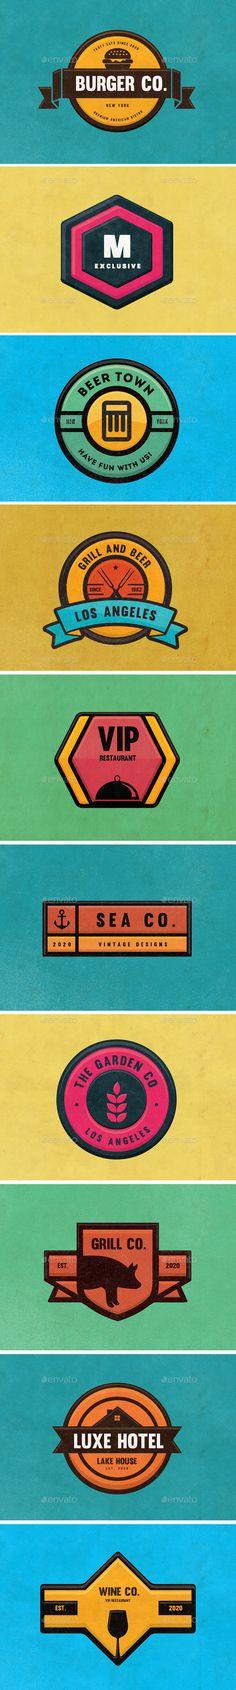 10 Logos & Badges Pack #design Download: http://graphicriver.net/item/10-logos-badges-pack-01/12974792?ref=ksioks